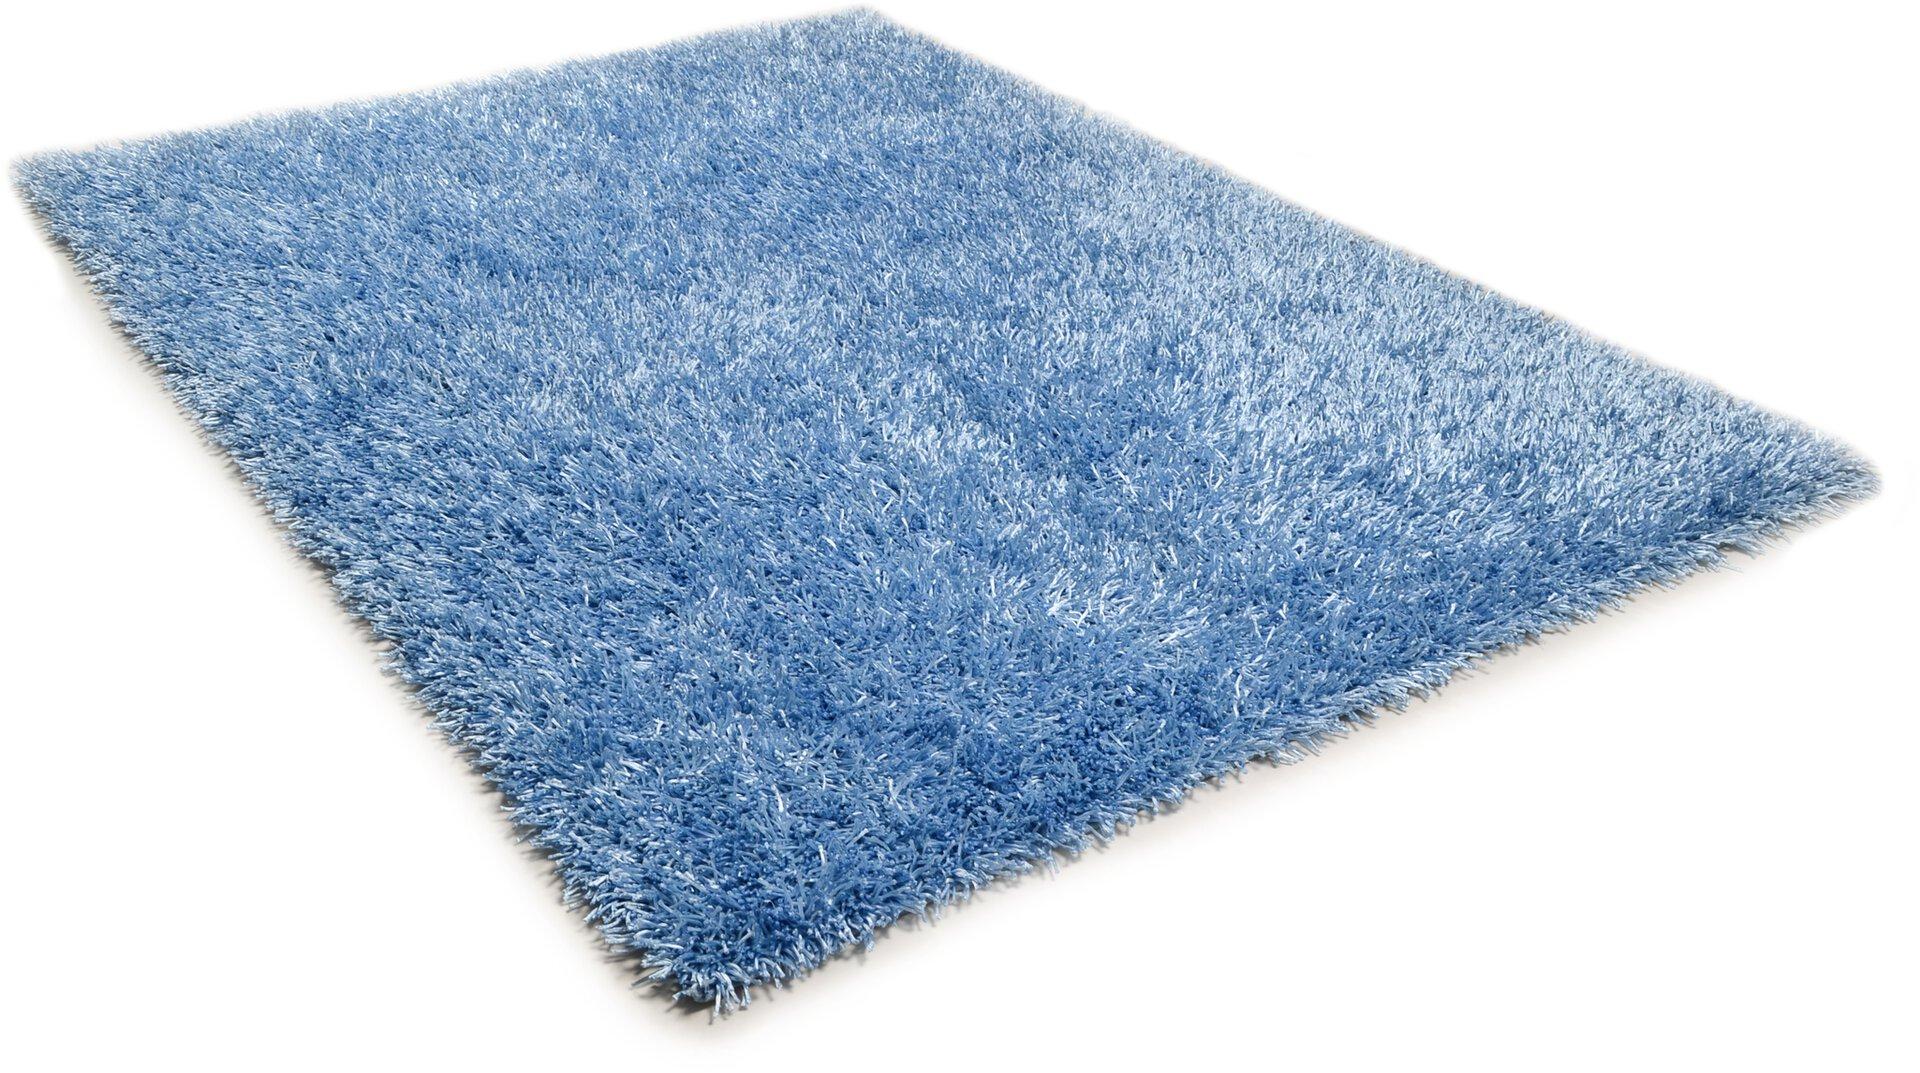 Handtuftteppich Pop Theko Textil Blau 1 cm